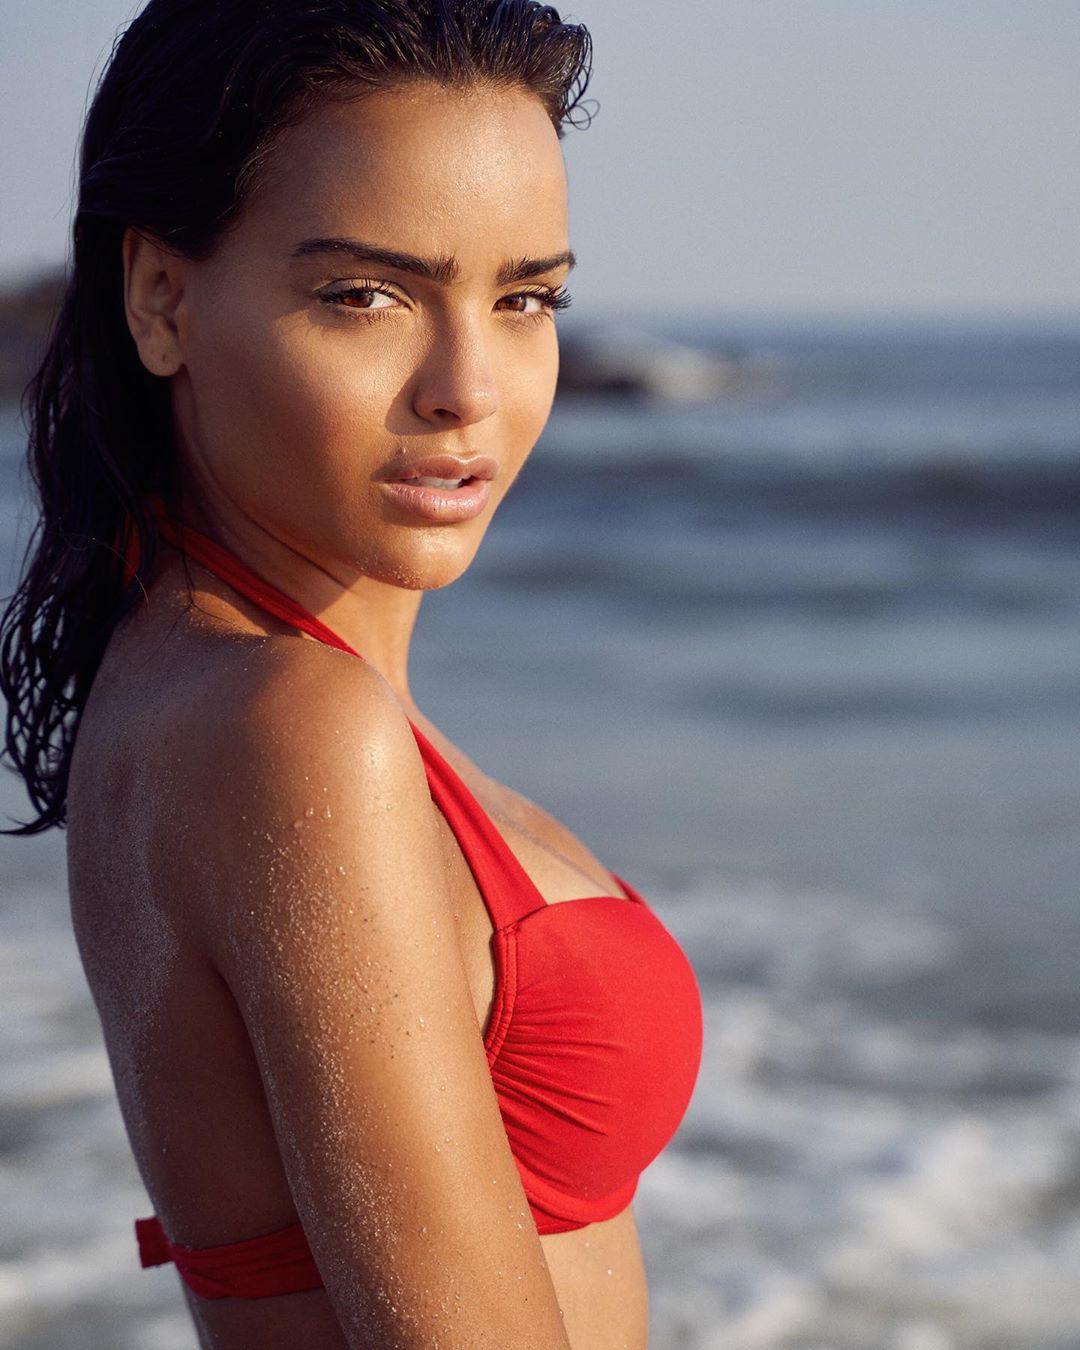 Lisa Ramos bikini swimwear , best photoshoot ideas